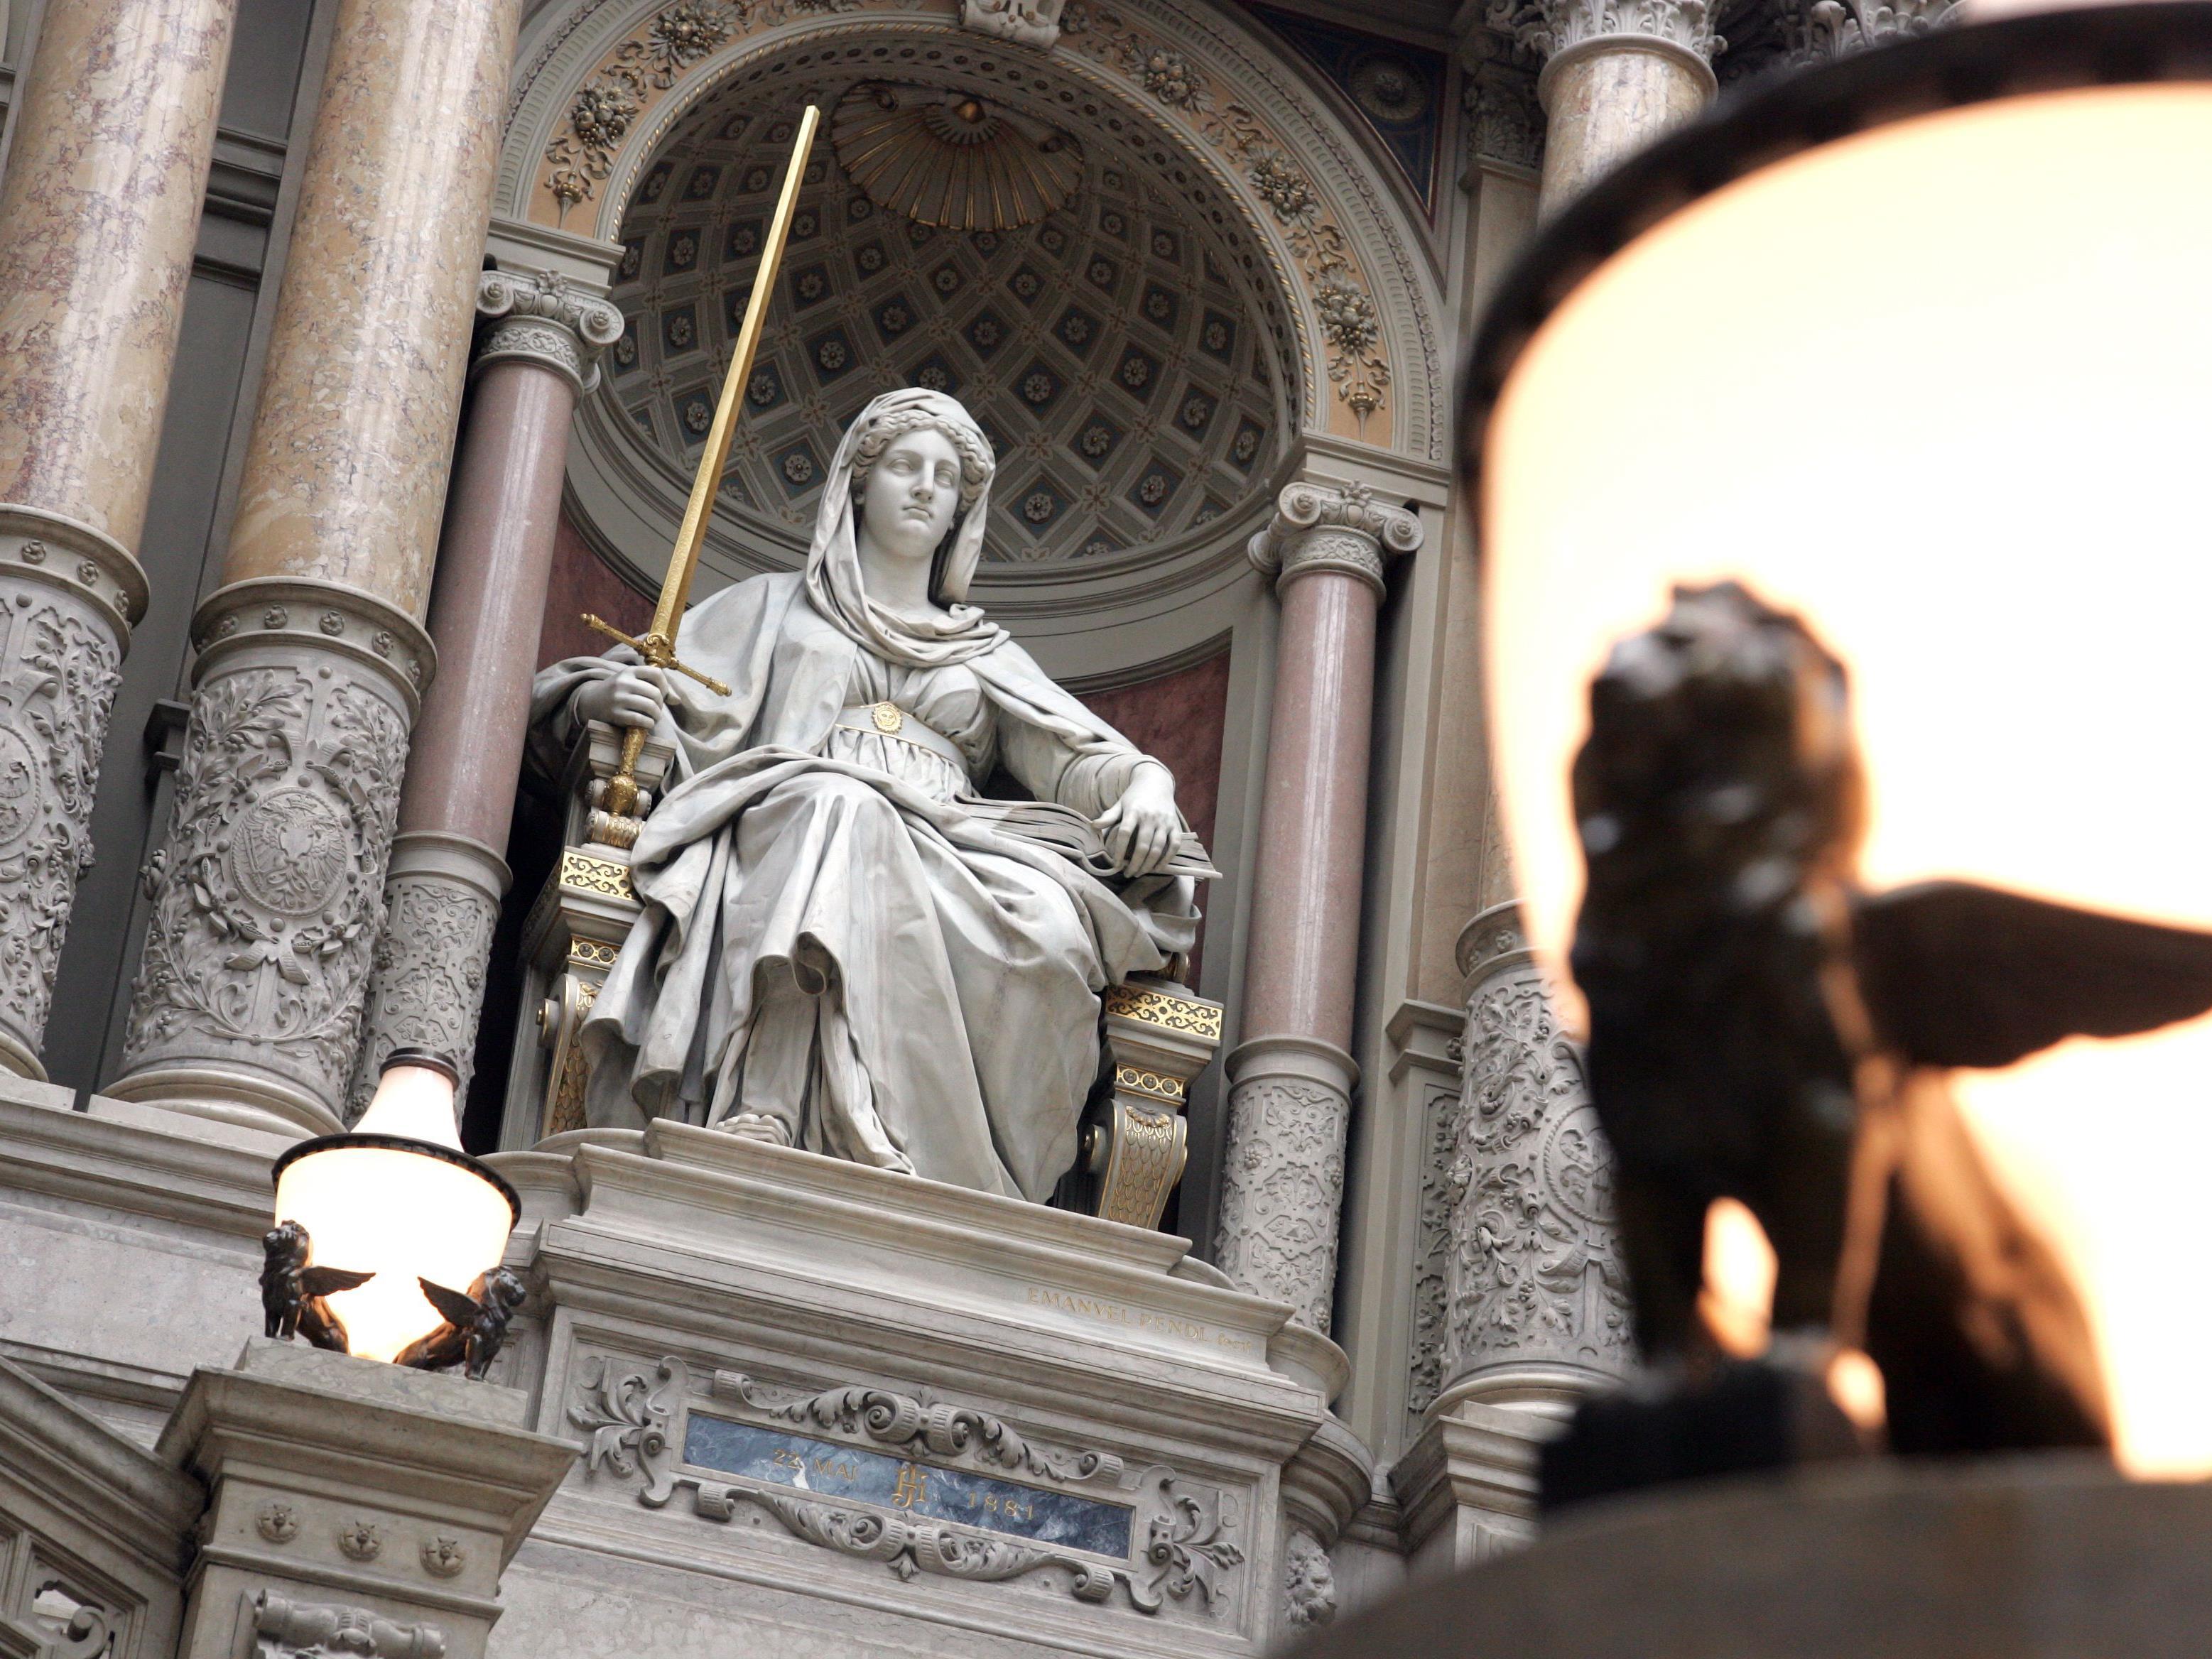 Die Justitia-Statue vor dem Wiener Justizpalast.